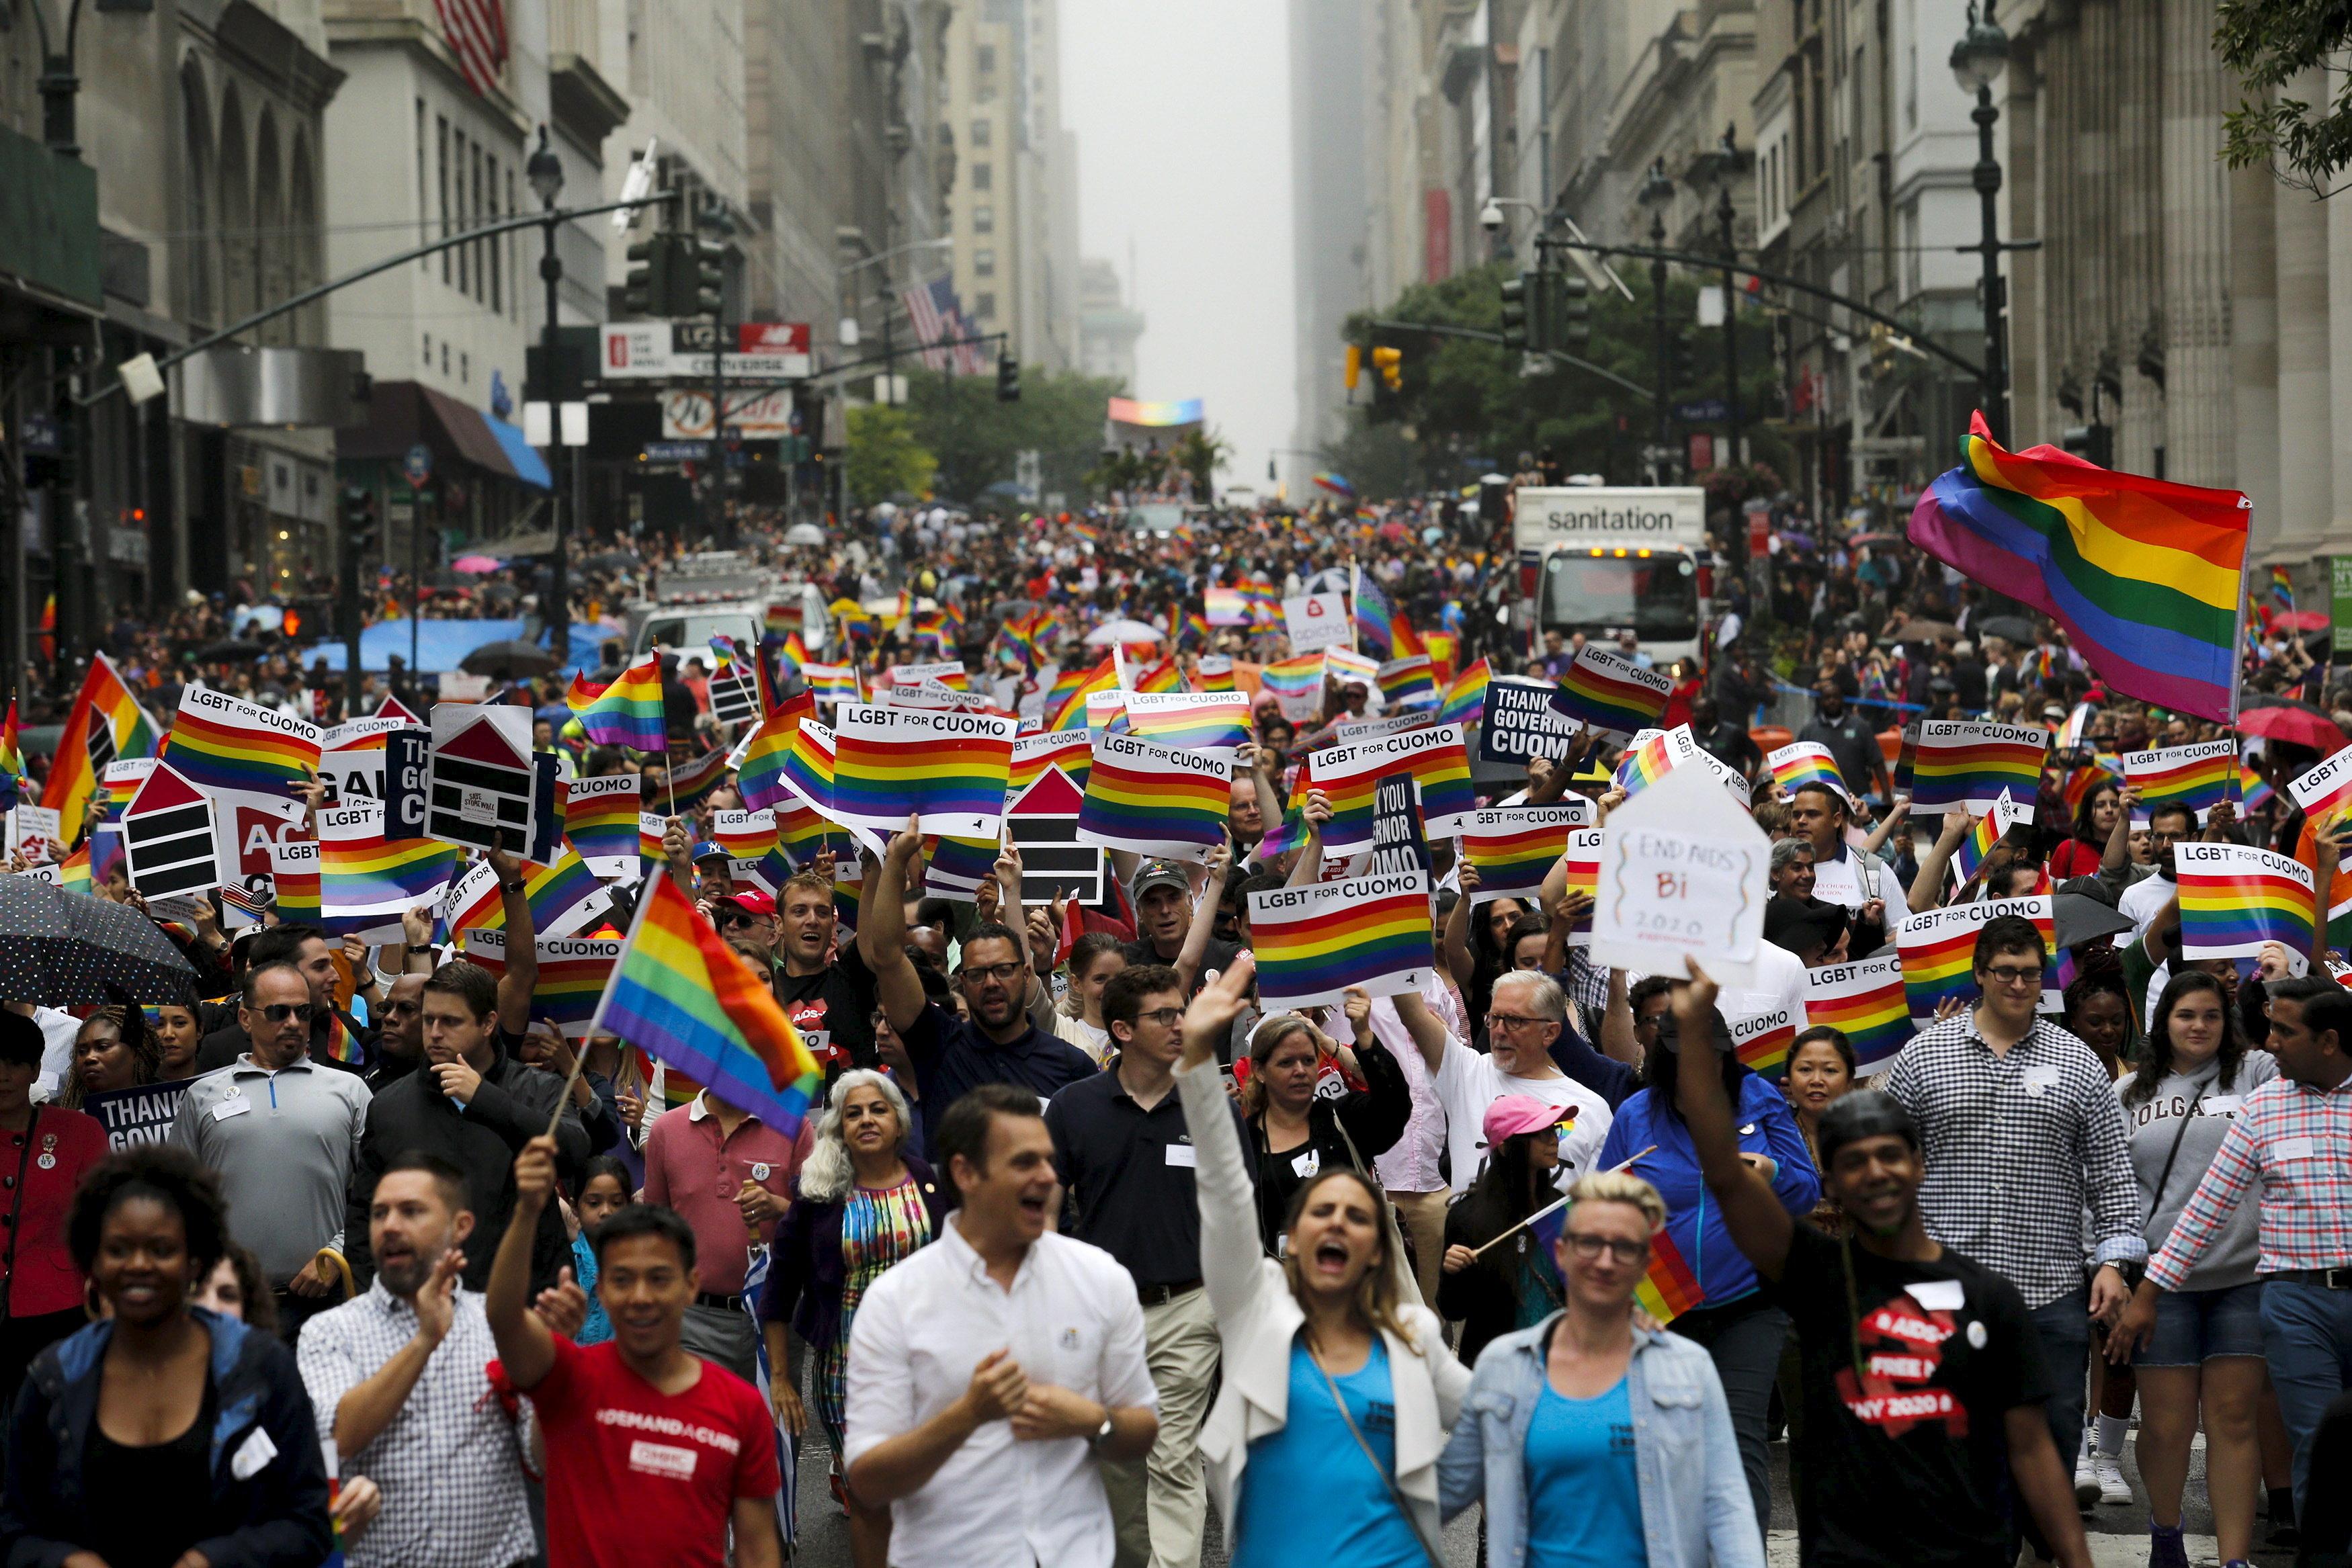 People march down 5 Av during the annual Gay Pride parade in New York June 28, 2015. REUTERS/Eduardo Munoz